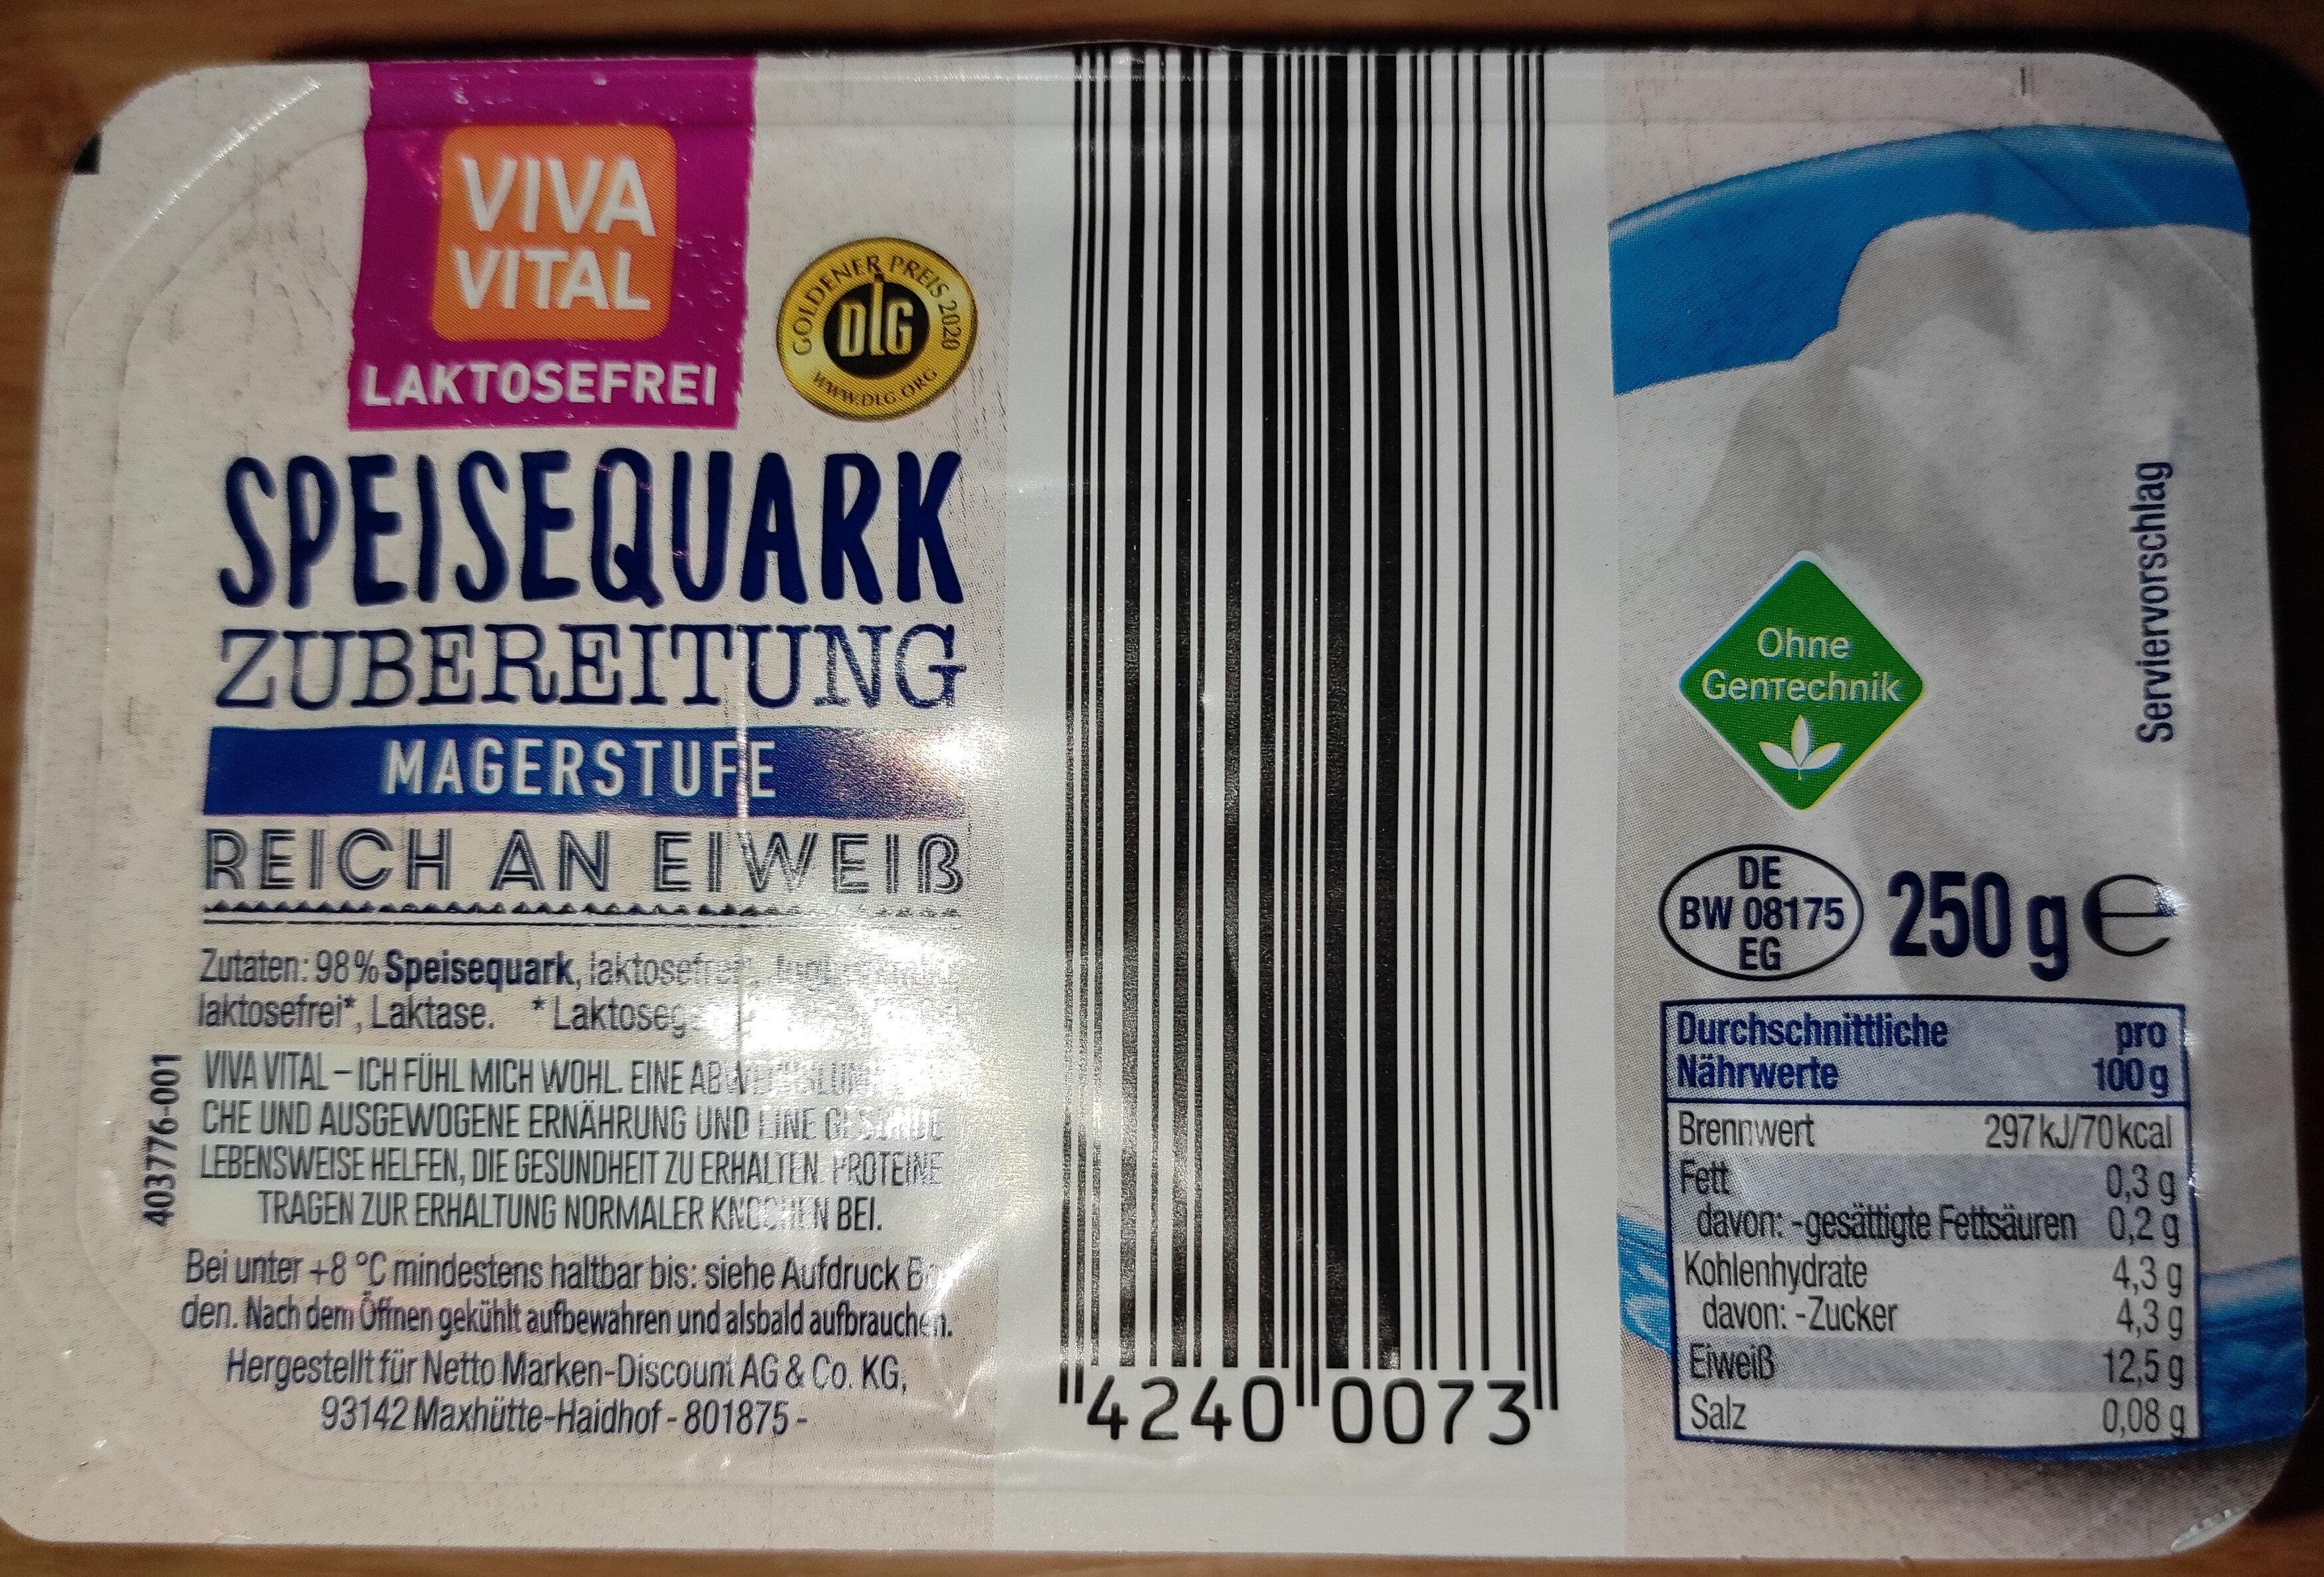 viva vital Laktosefrei Speisequark - Produkt - de